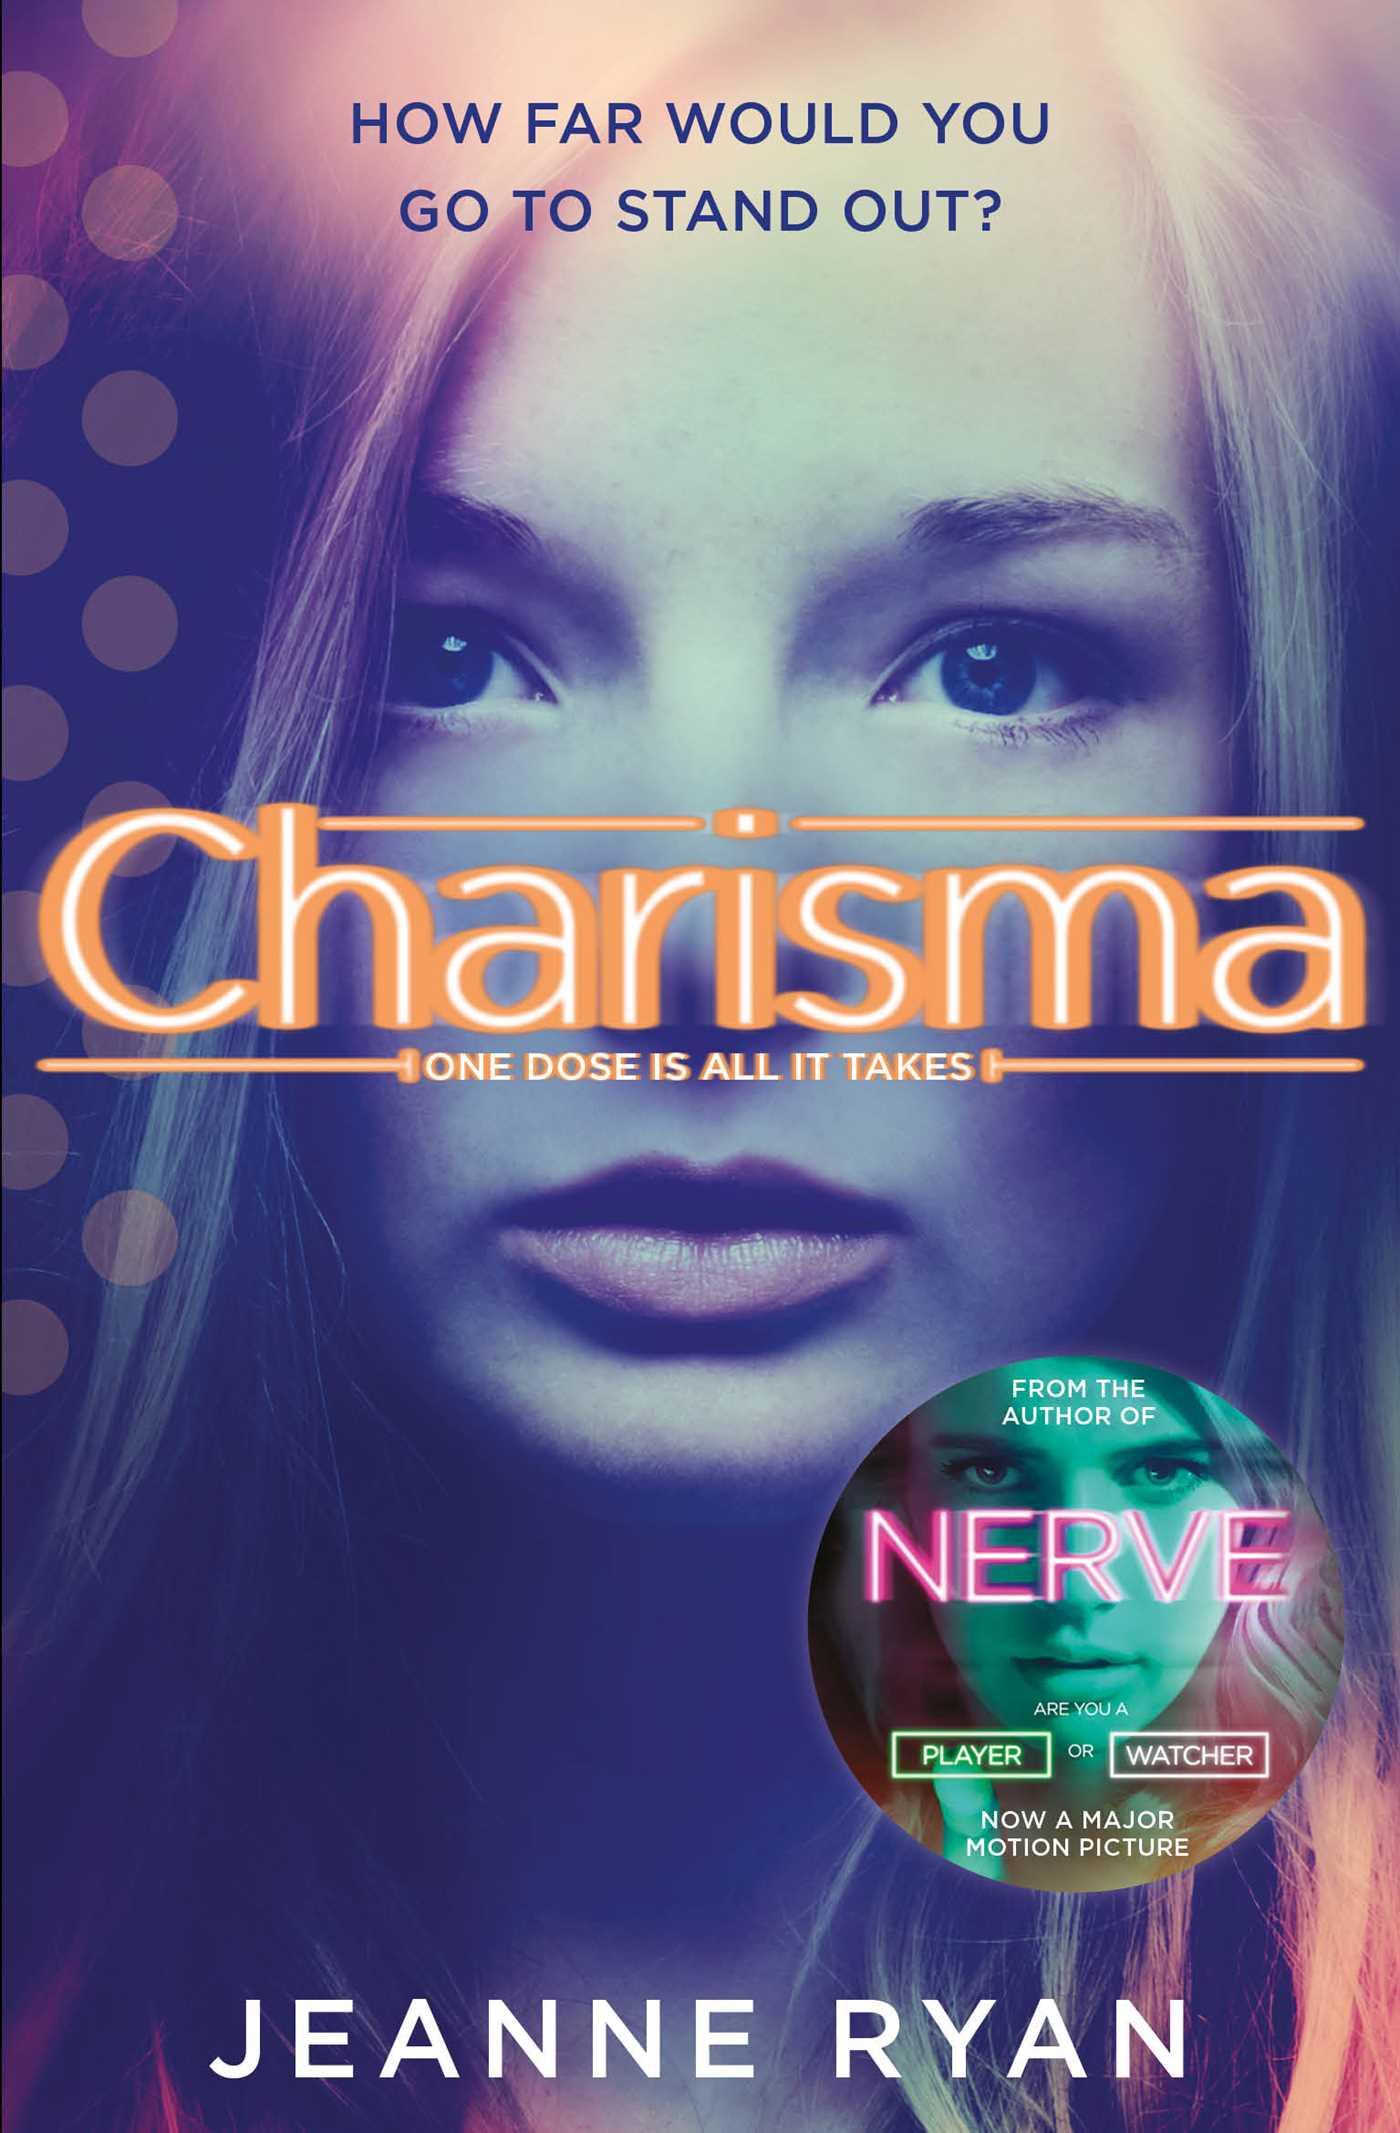 Charisma 9781471163937 hr